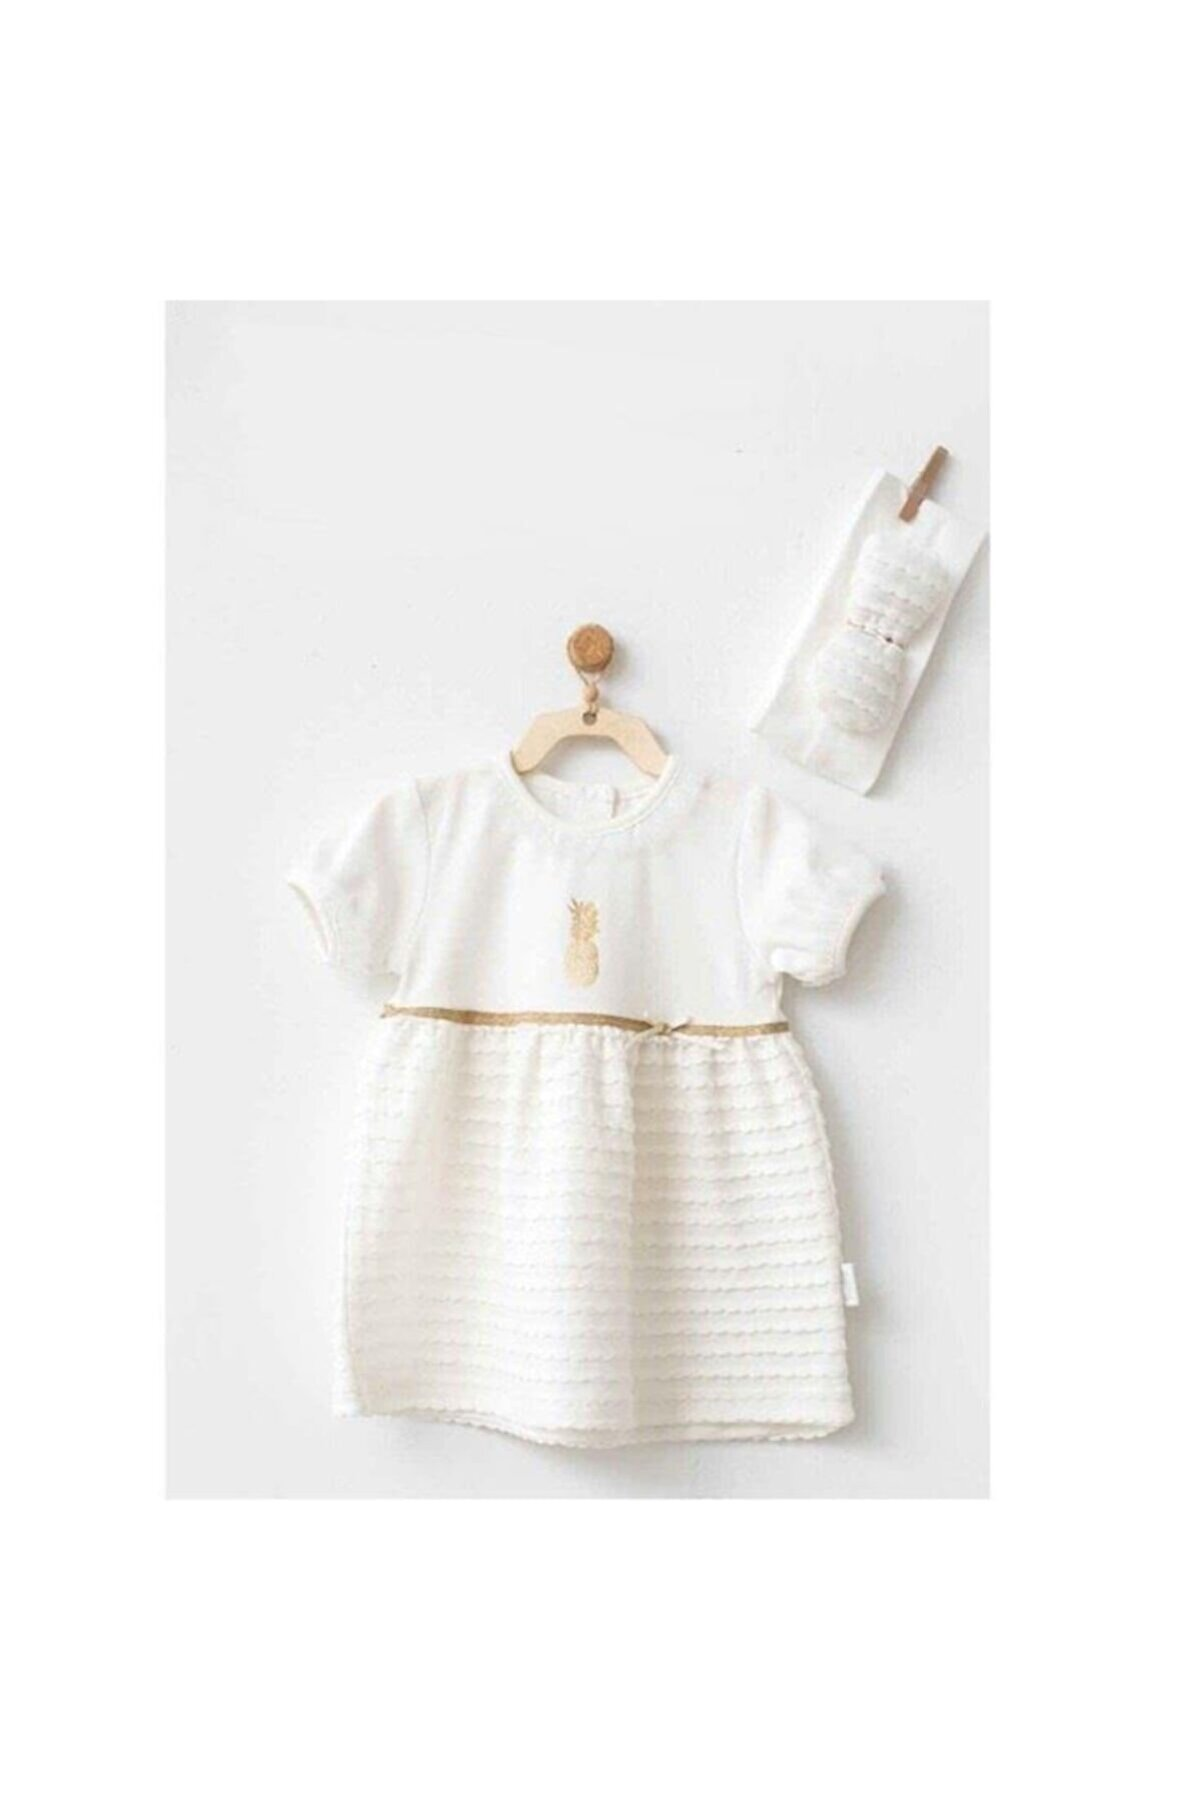 Andy Wawa Kız Bebek Ekru Elbise ve Bandana 2'li Set